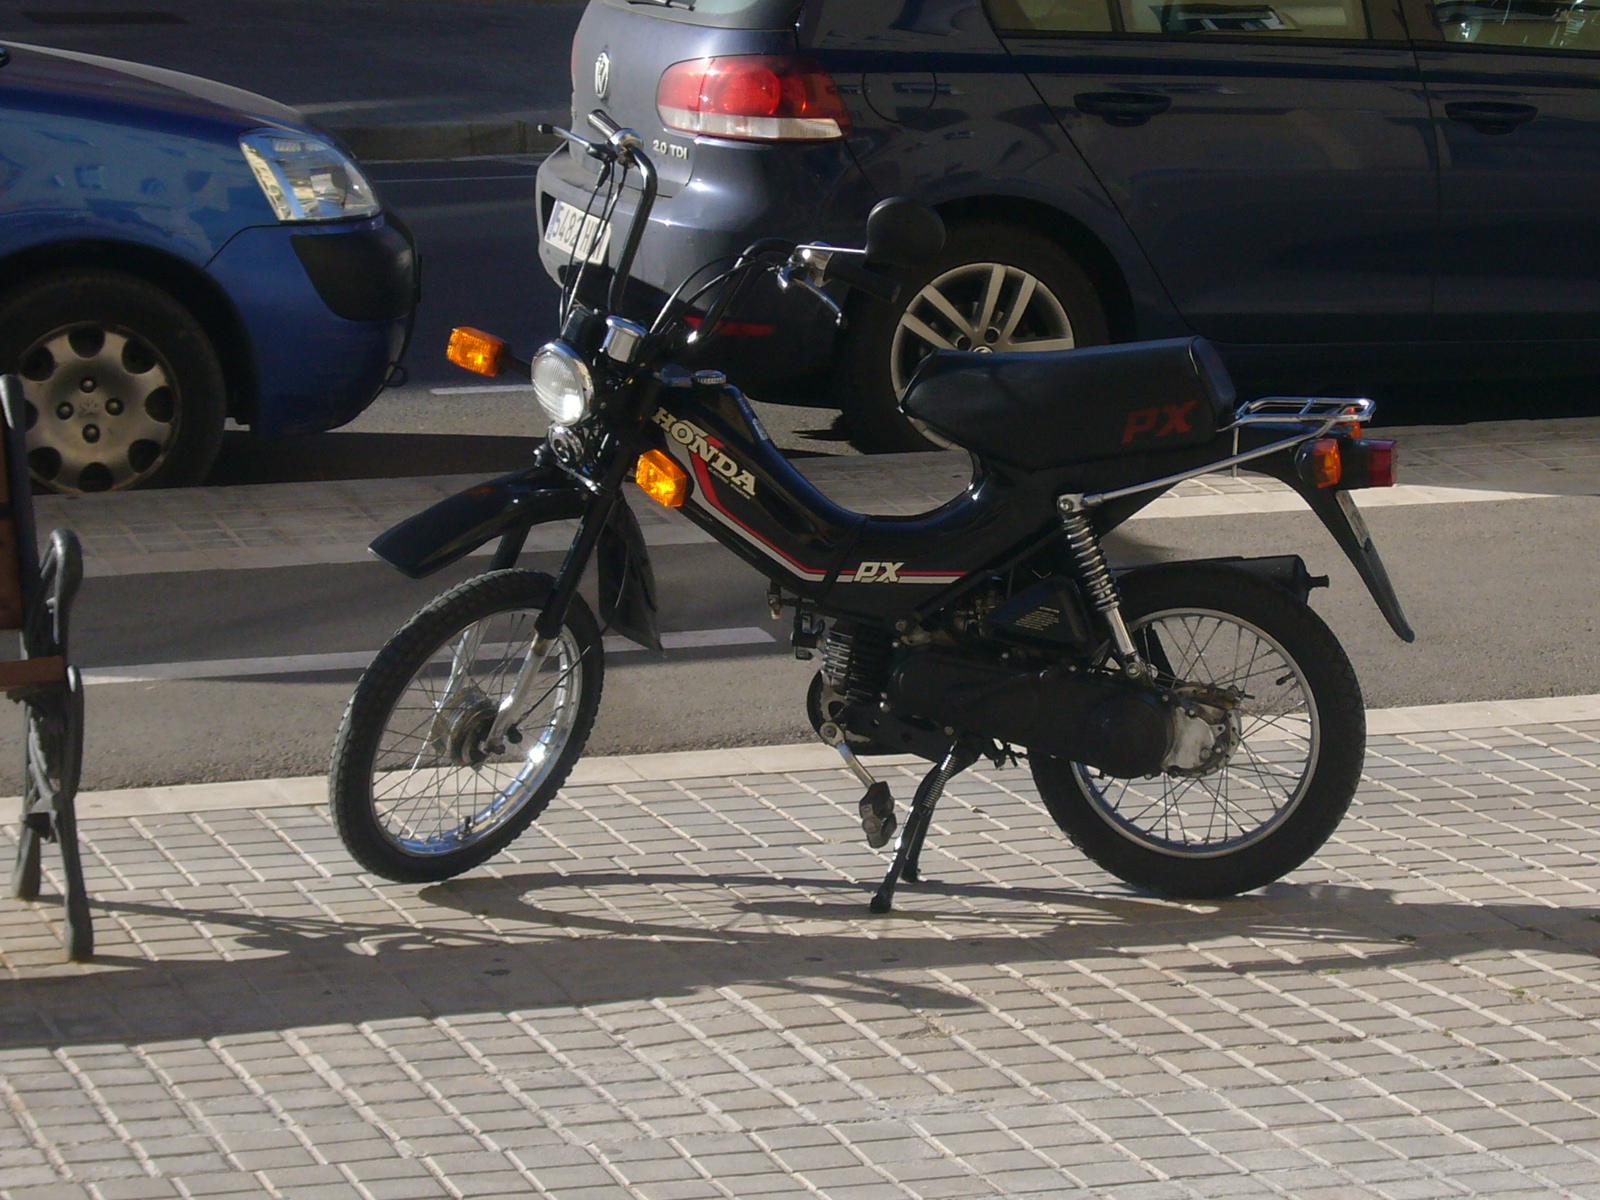 HONDA -  Mi Honda PX '84 - Página 2 09048553bdb03a37cc3cd3c67ab48b6co